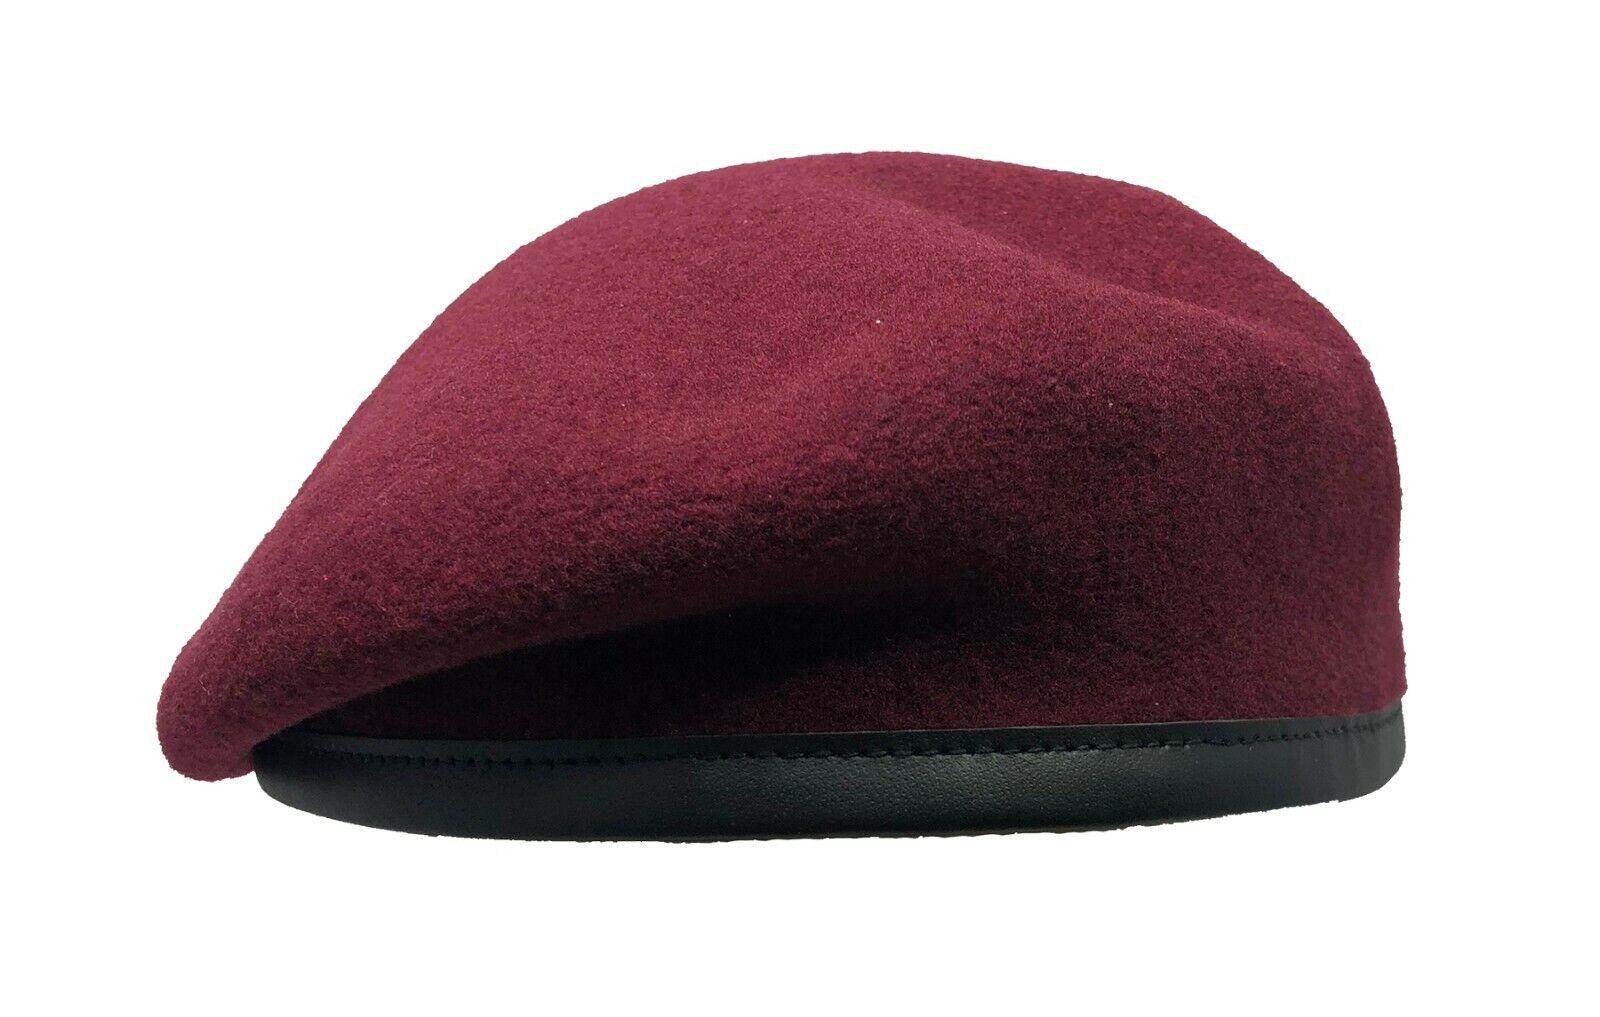 Laulh/ère Hats Merino Wool French Military Beret Black